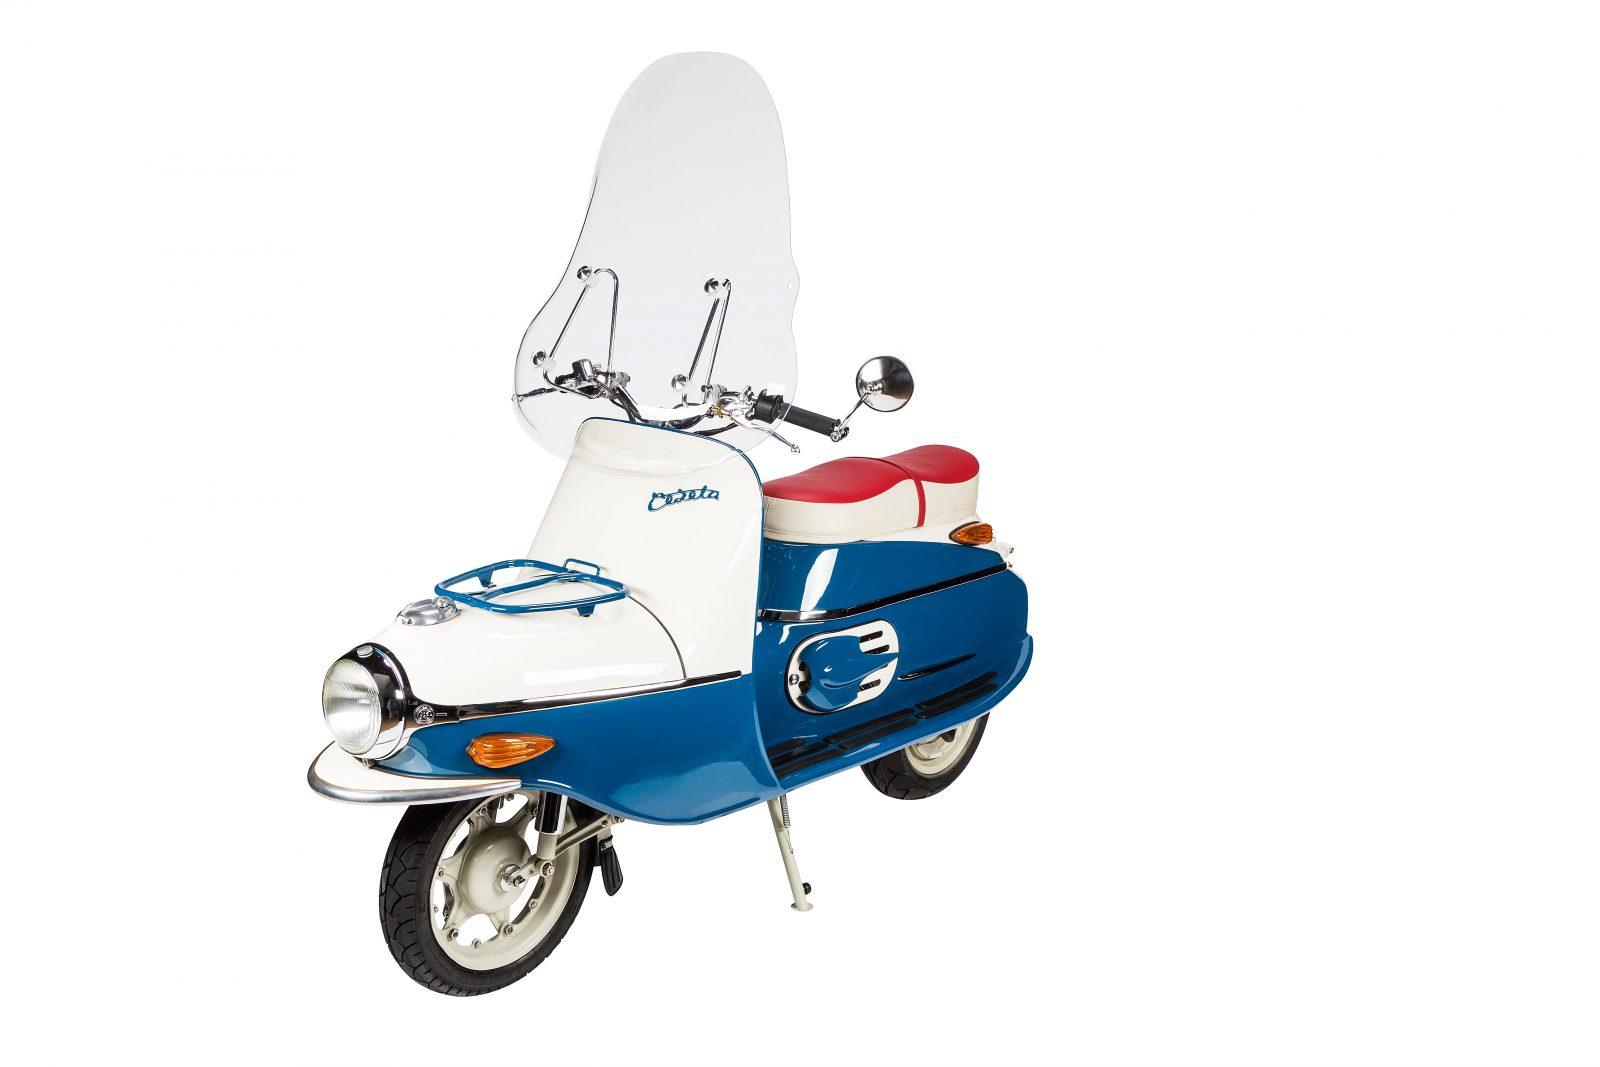 Cezeta 506 Electric Scooter 1600x1067